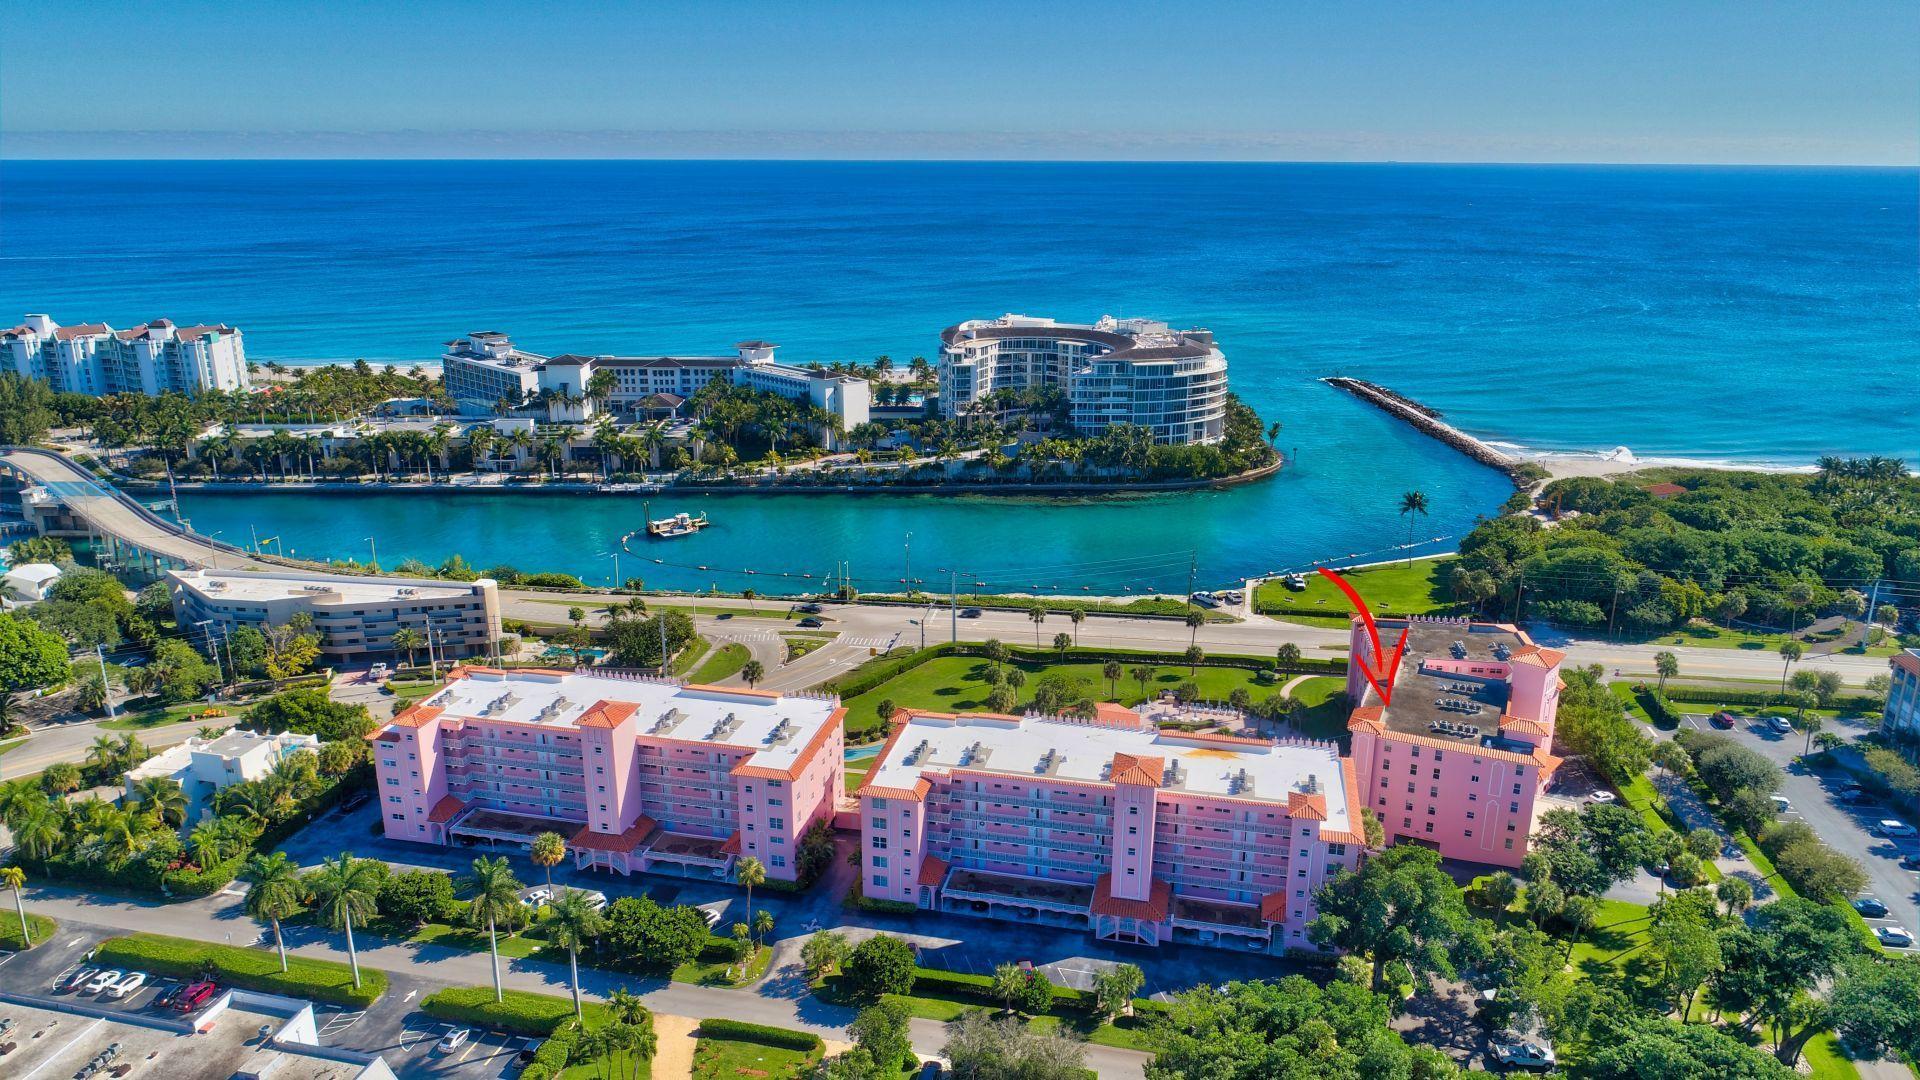 1099 Ocean Blvd Boulevard, Boca Raton, Florida 33432, 2 Bedrooms Bedrooms, ,2 BathroomsBathrooms,Residential,For Sale,Ocean Blvd,RX-10656460